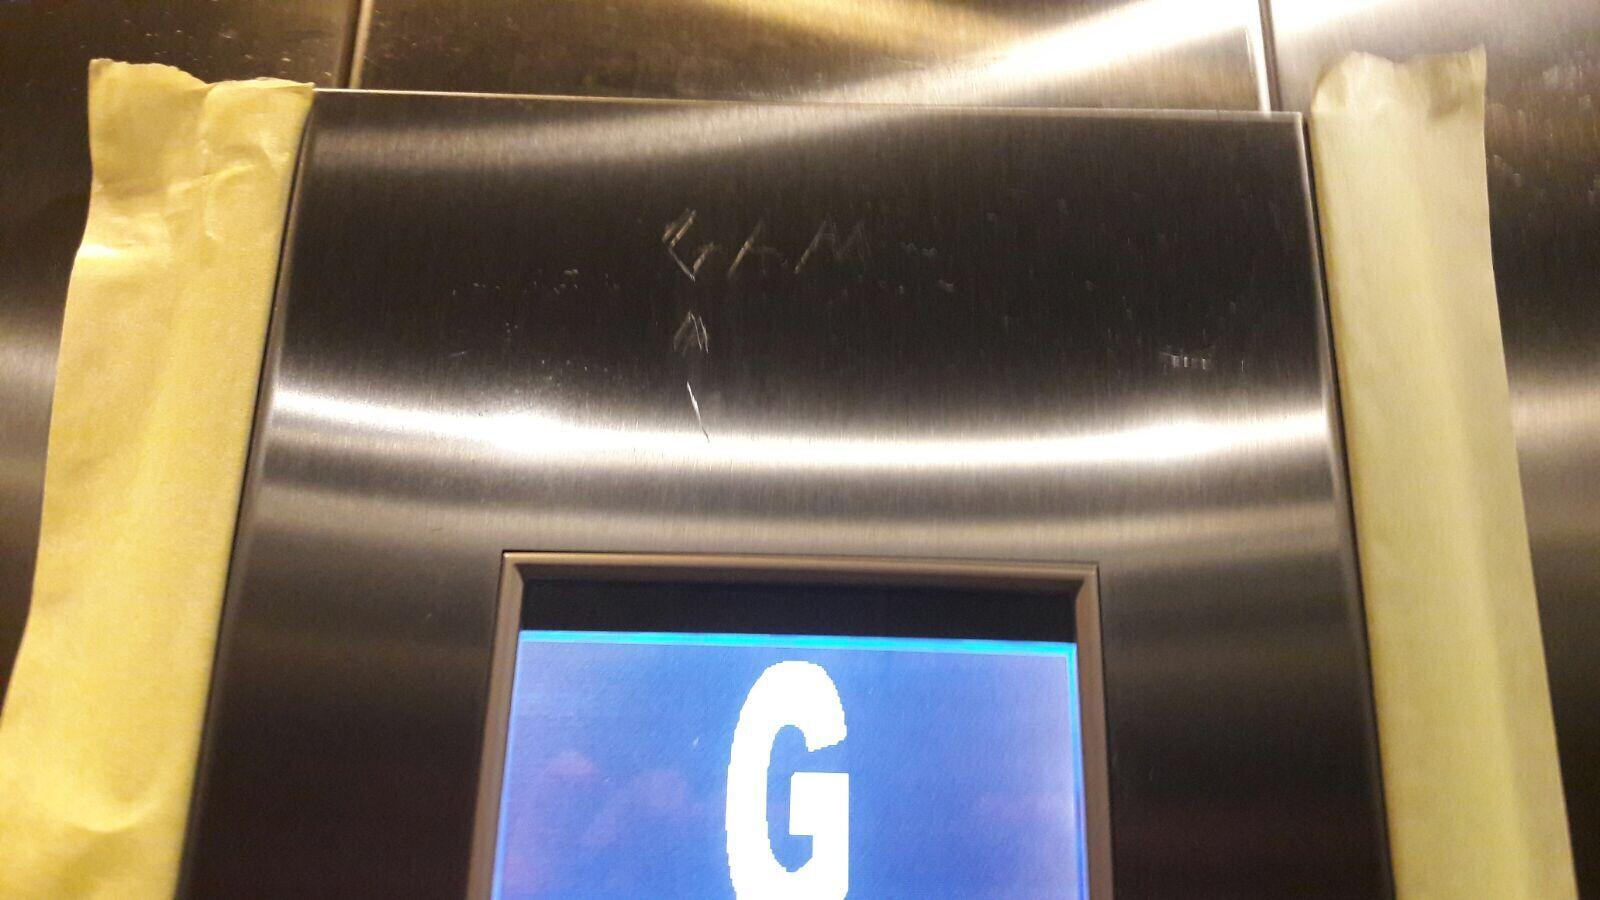 Lift control panel, graffiti removal